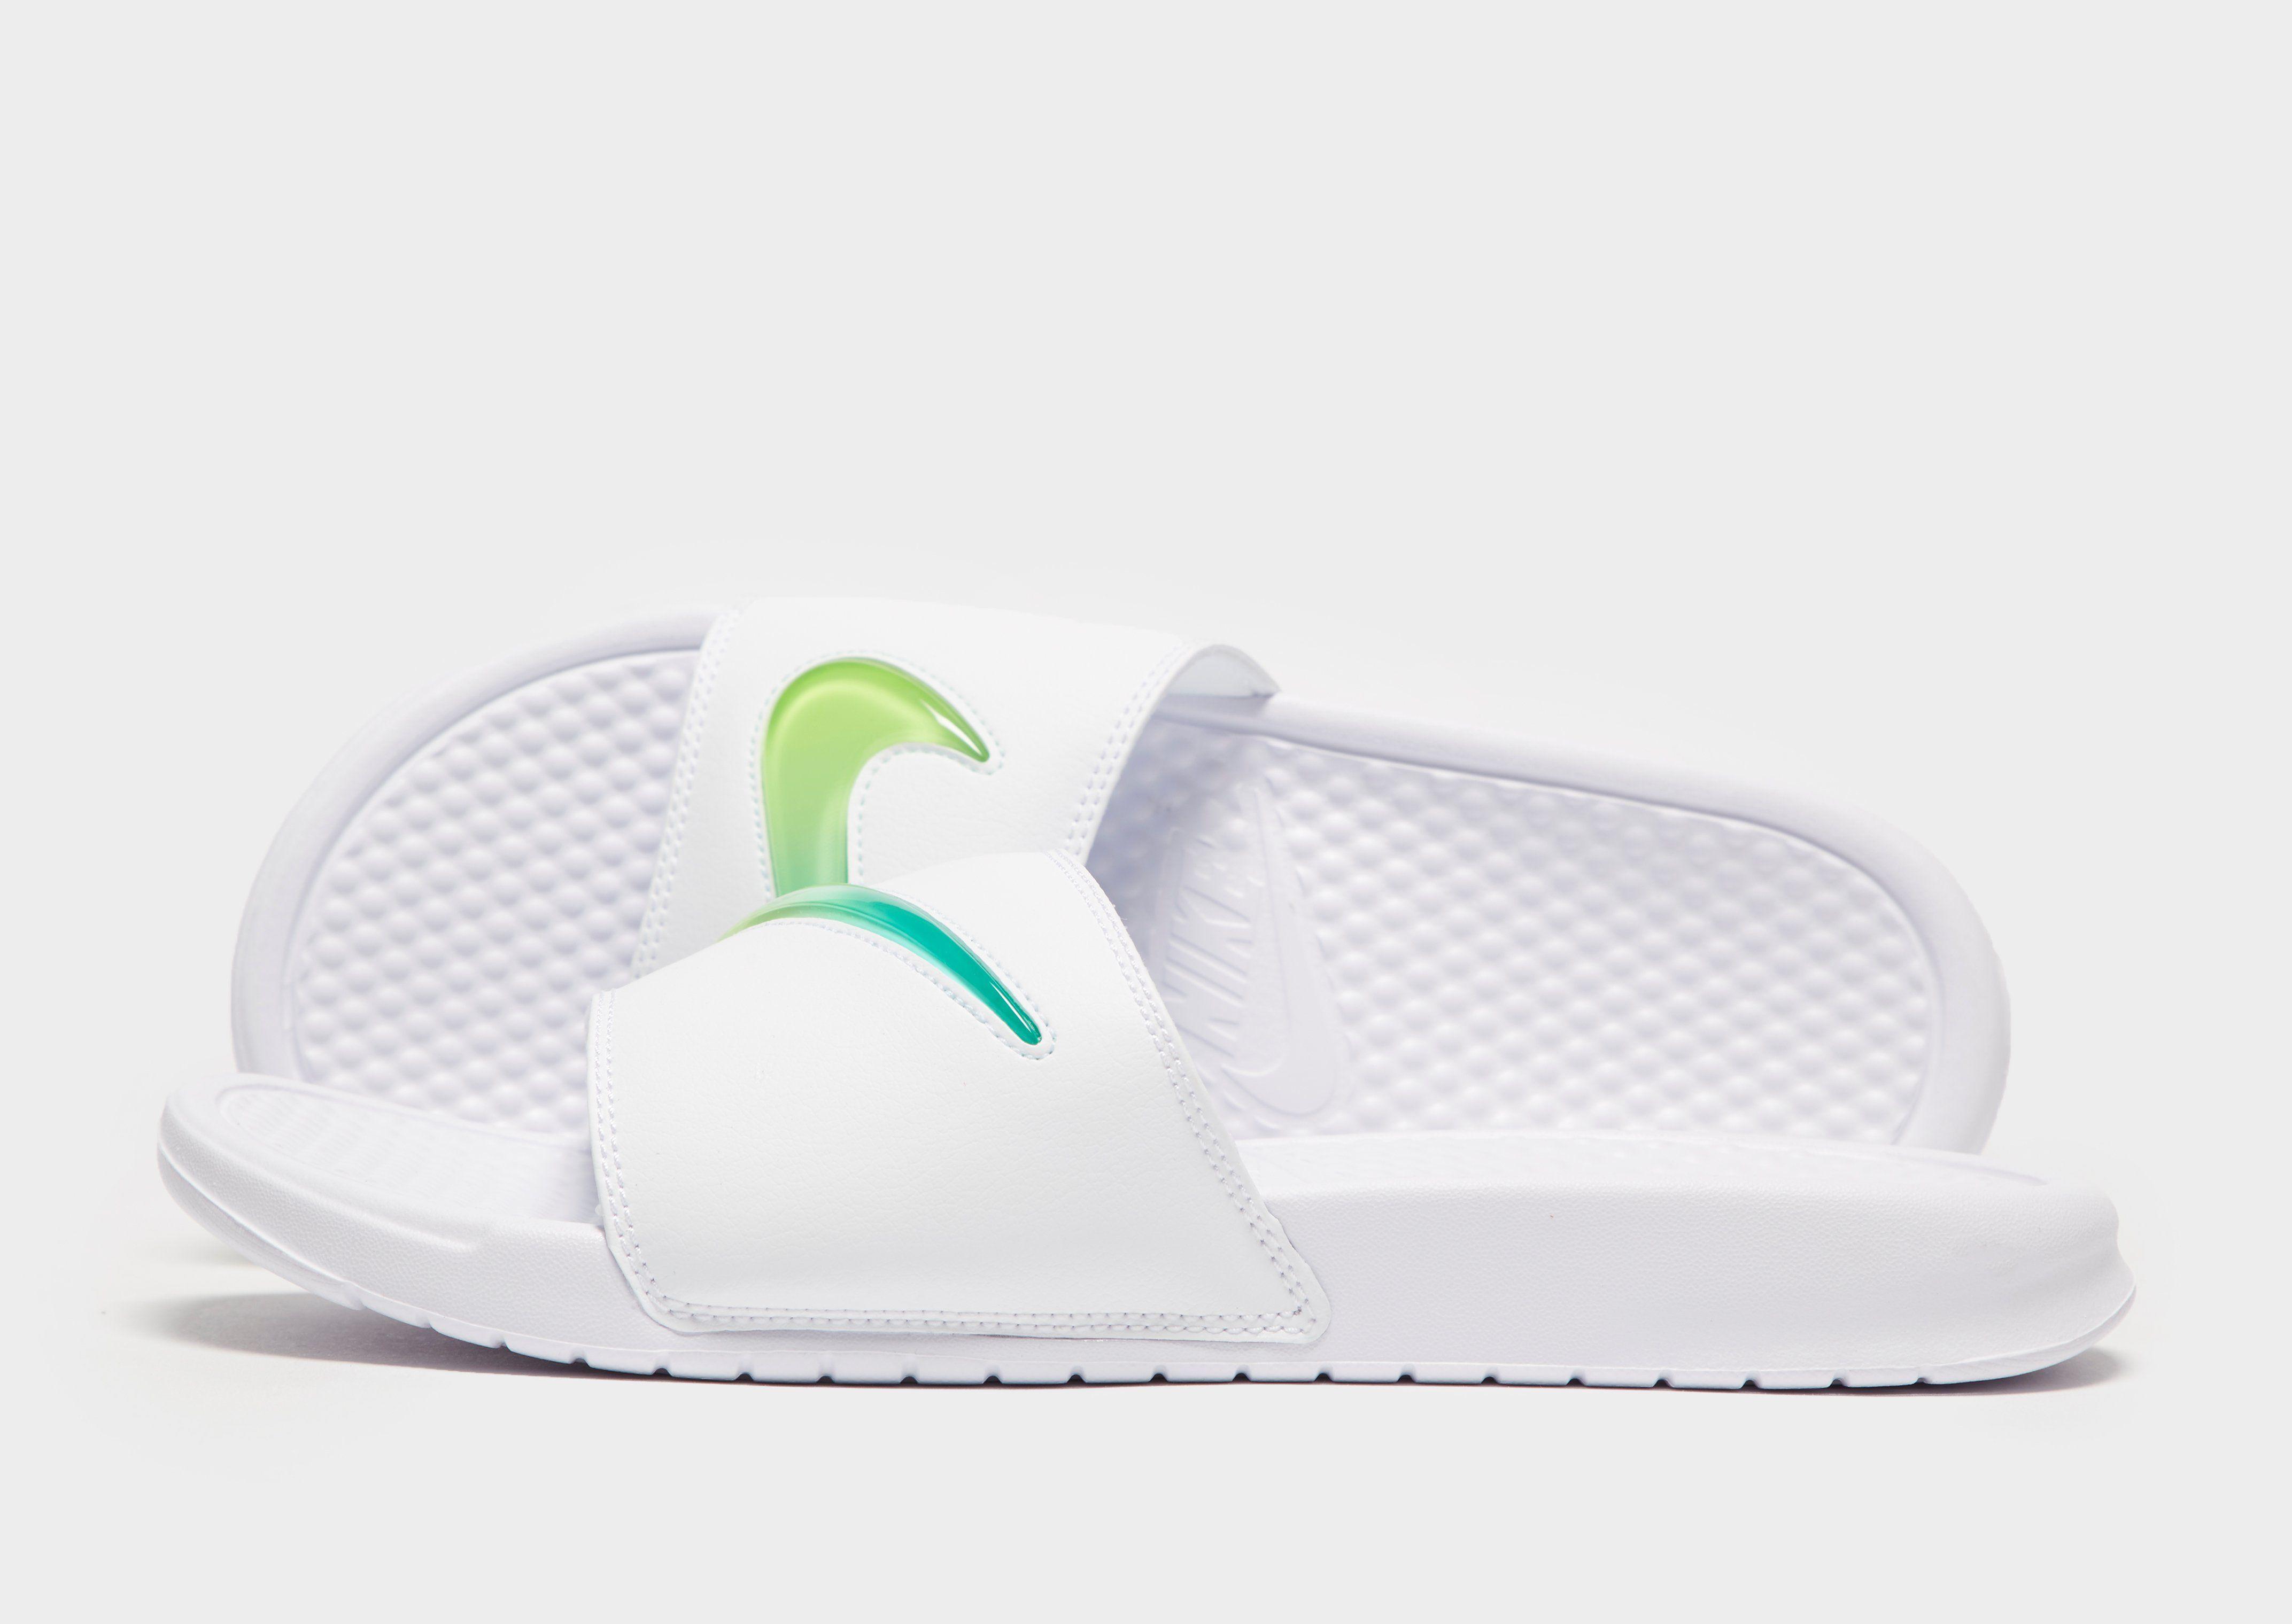 Nike Benassi SE Slides